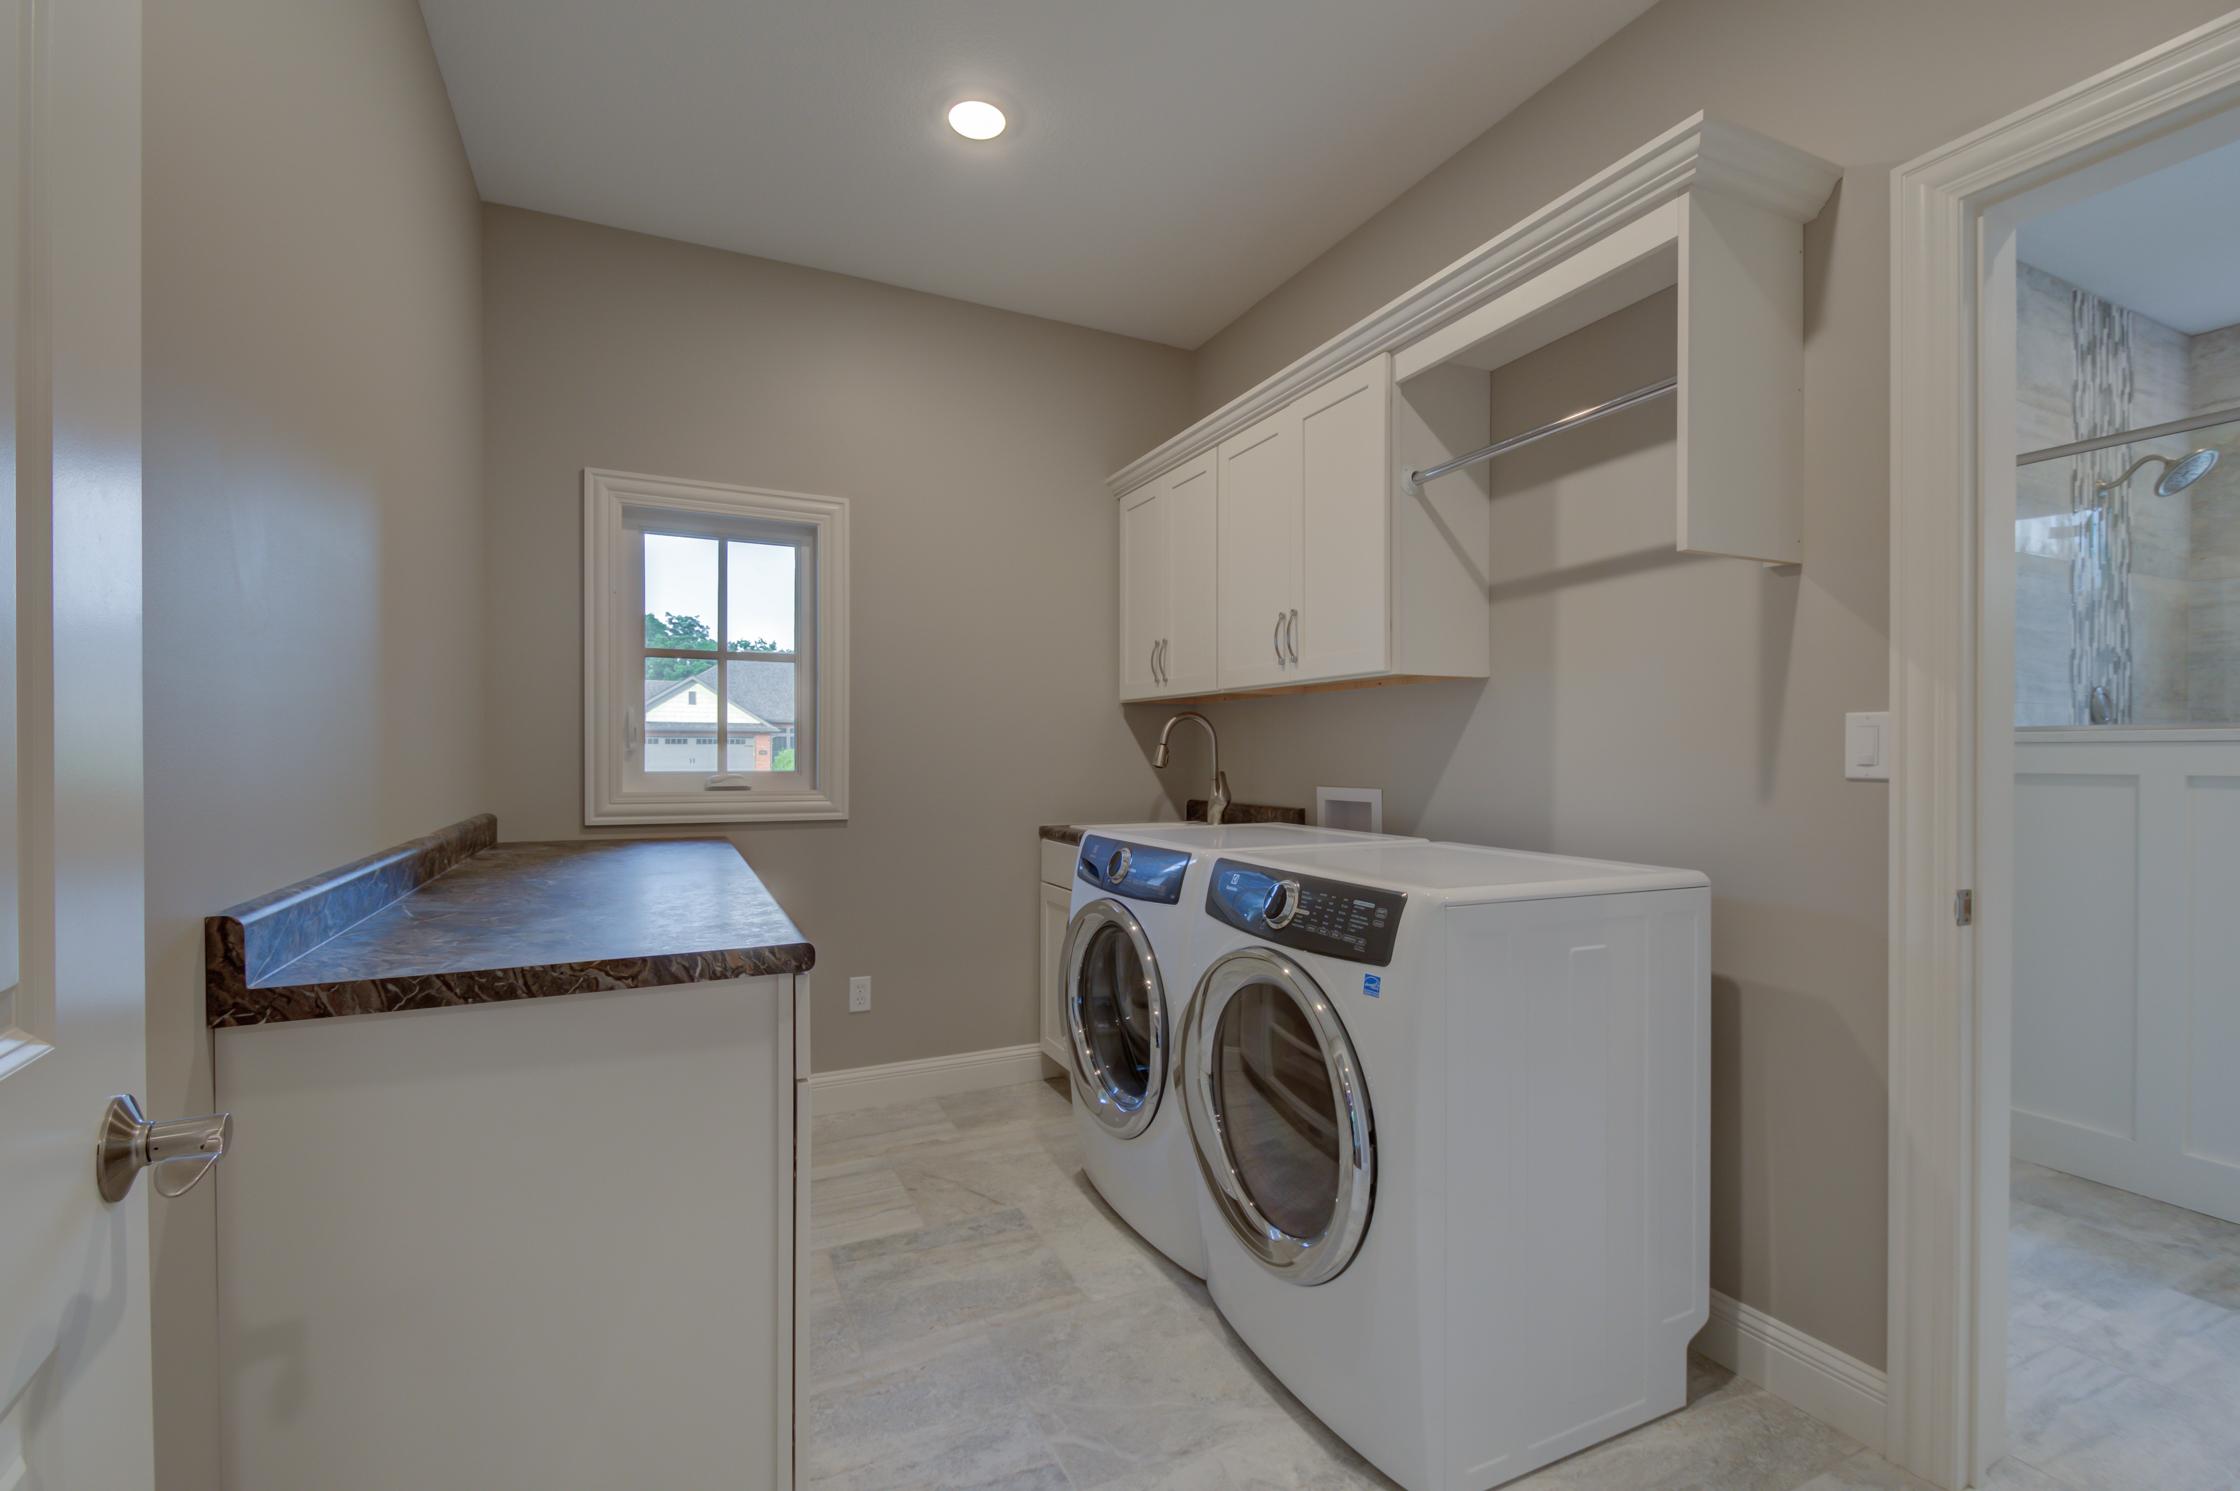 Laundry_Room_Old_Hawthorne.jpg